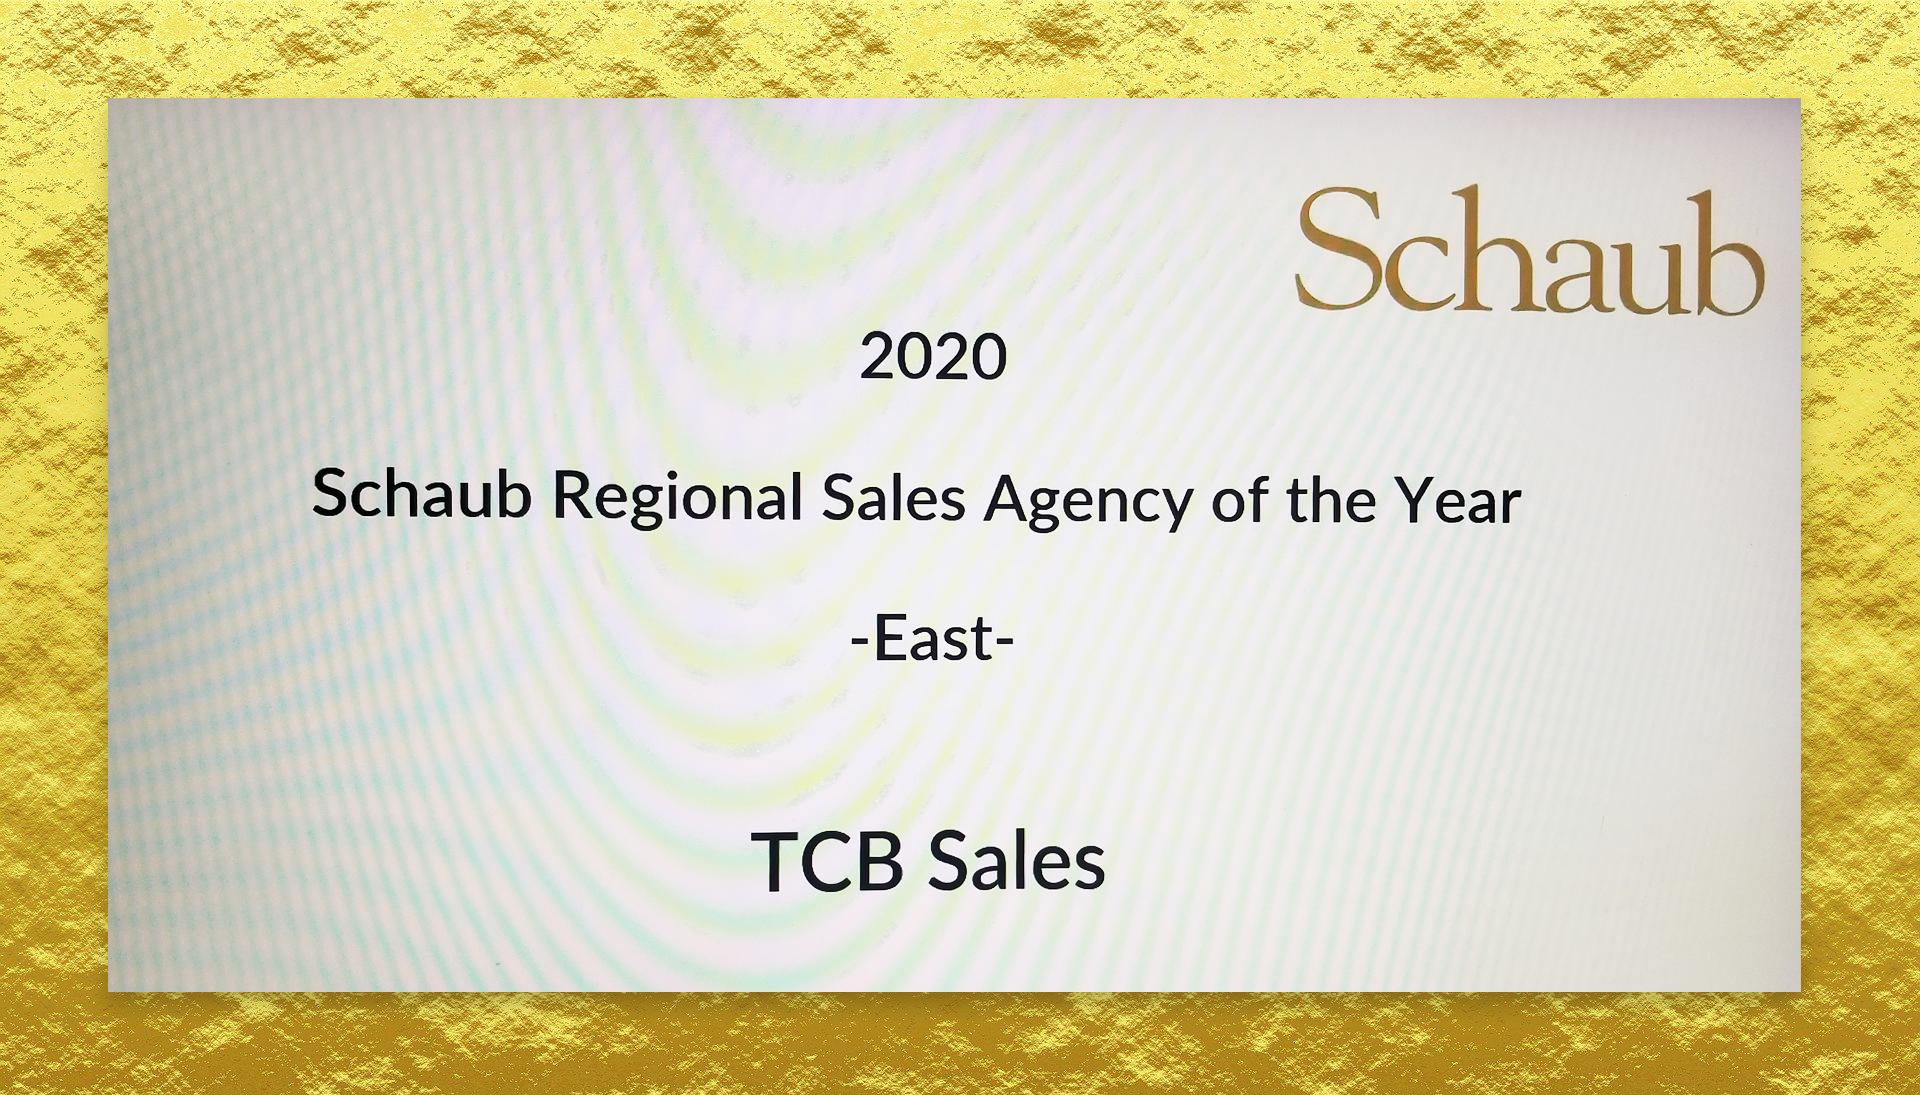 Schaub Award